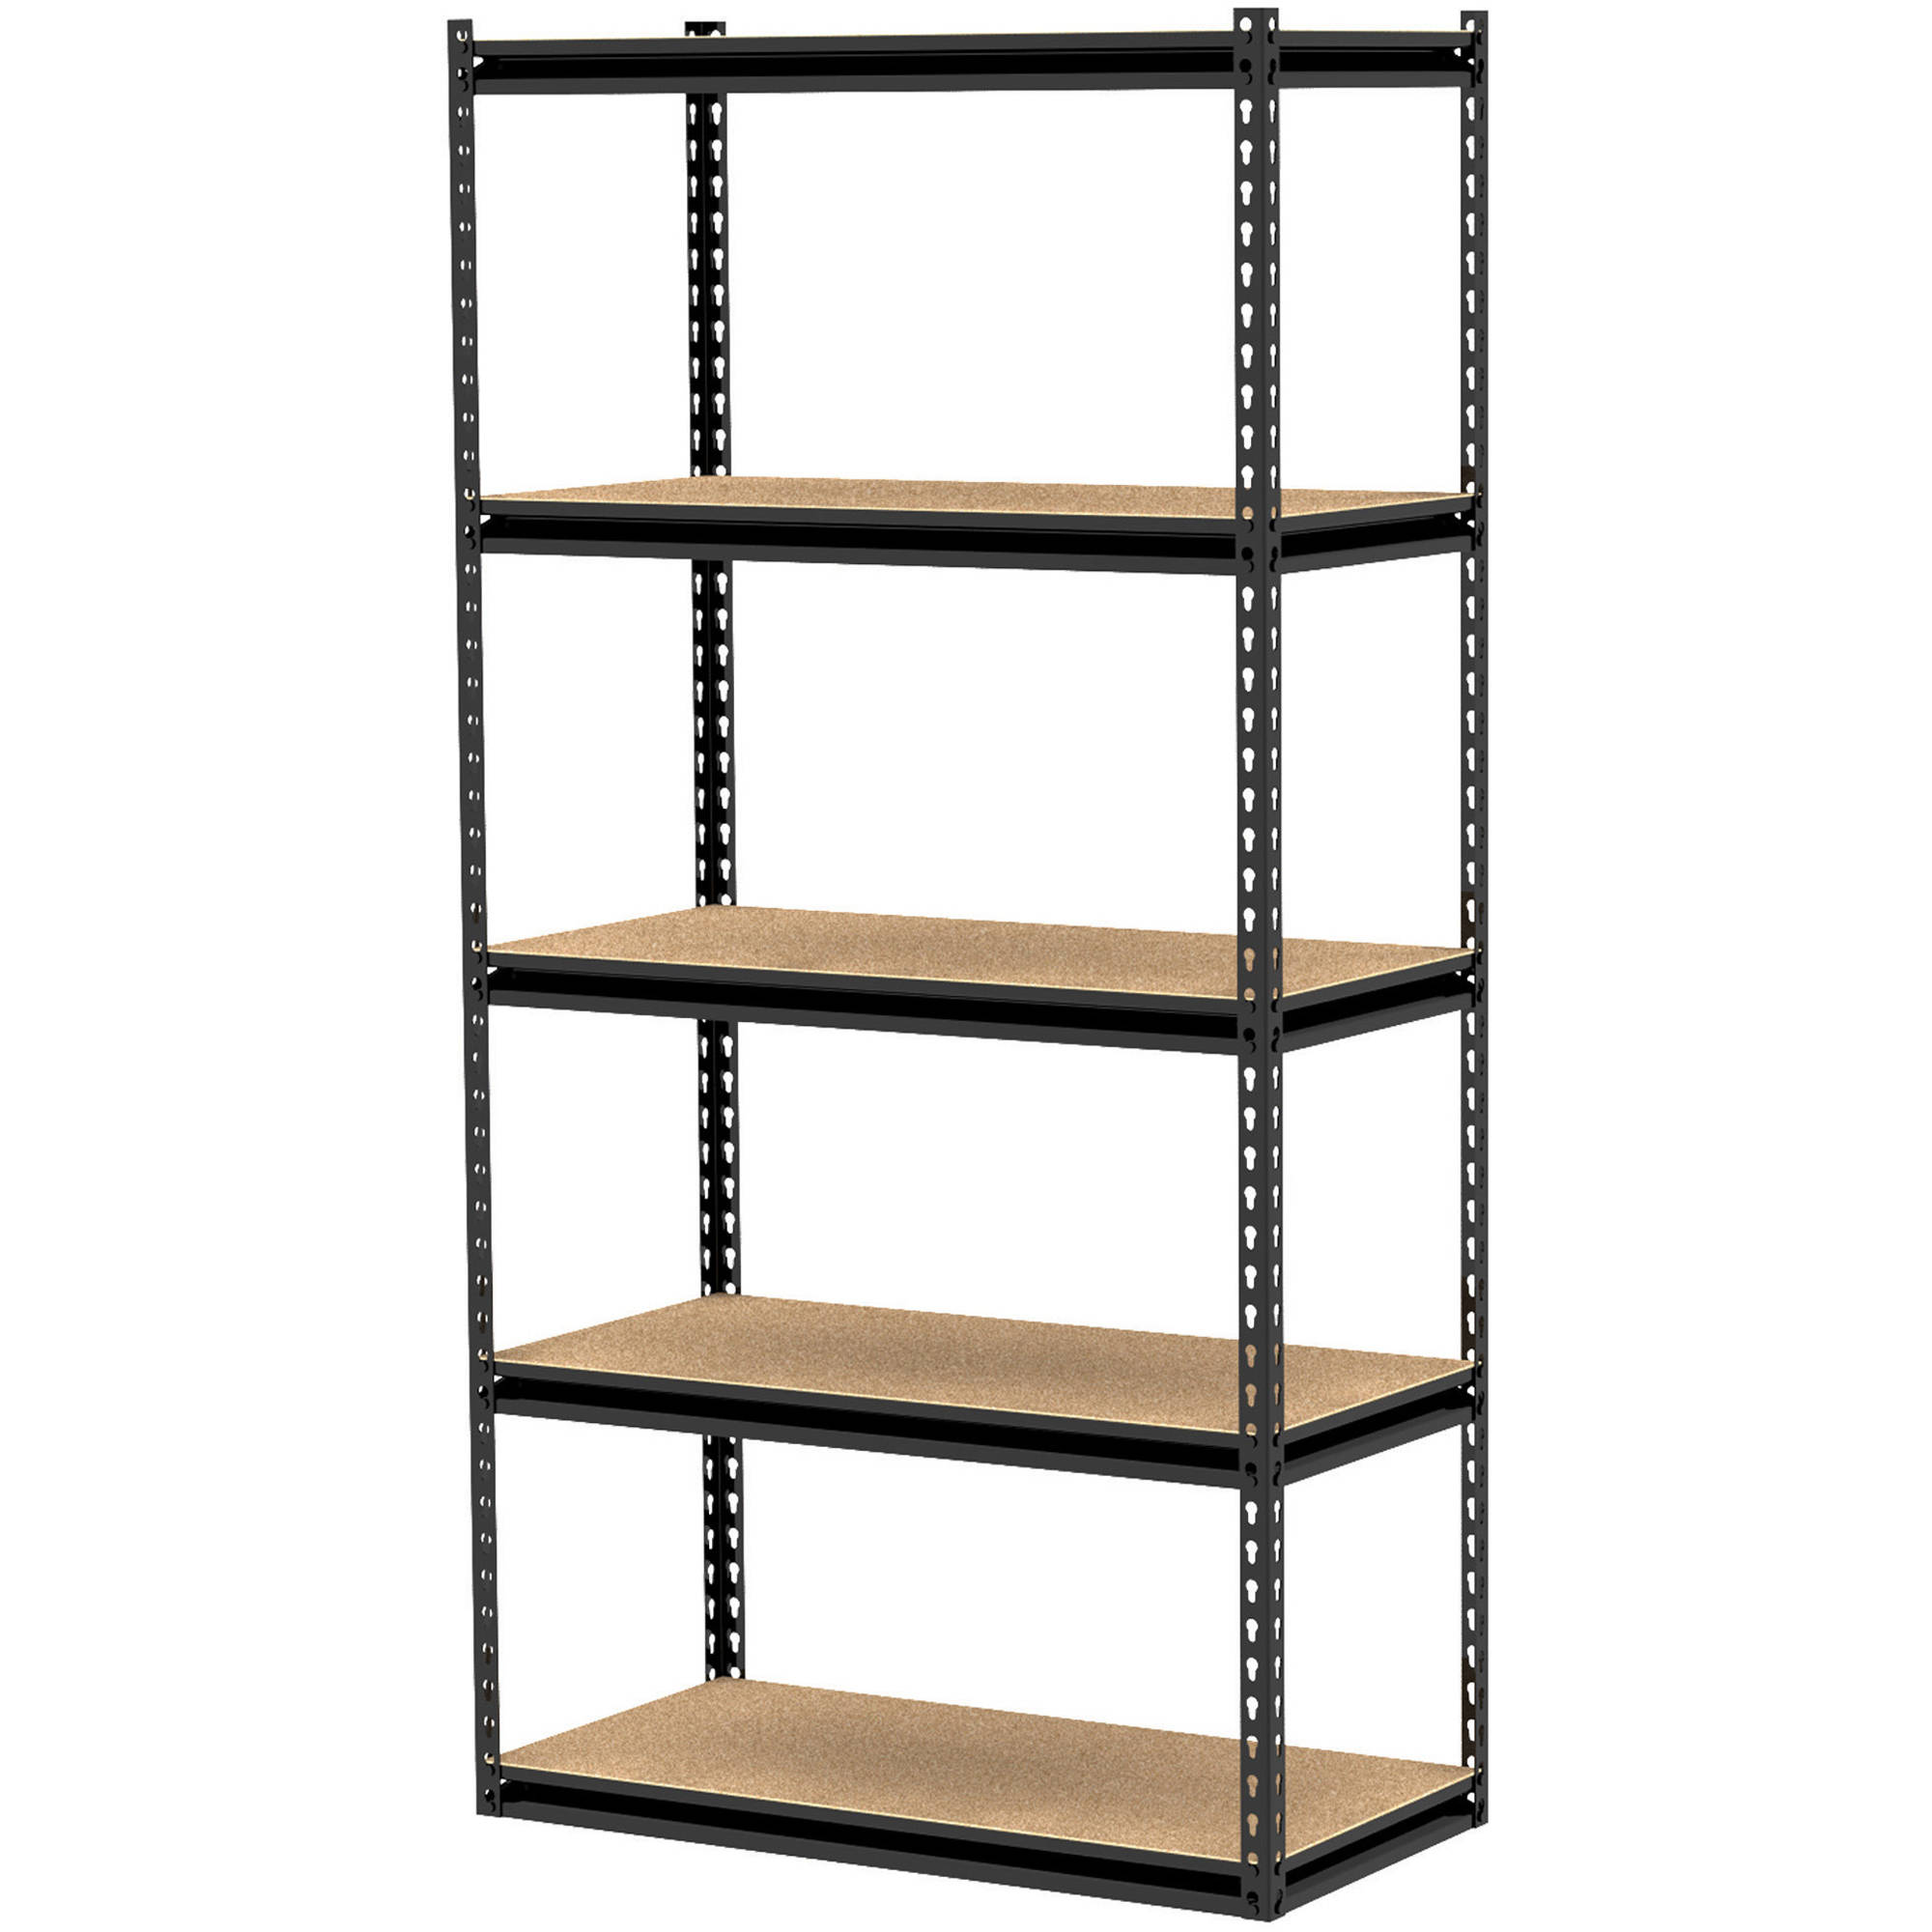 "Gorilla Rack 36"" x 18"" x 72"" 5-Shelf Z-Beam Unit, Black"